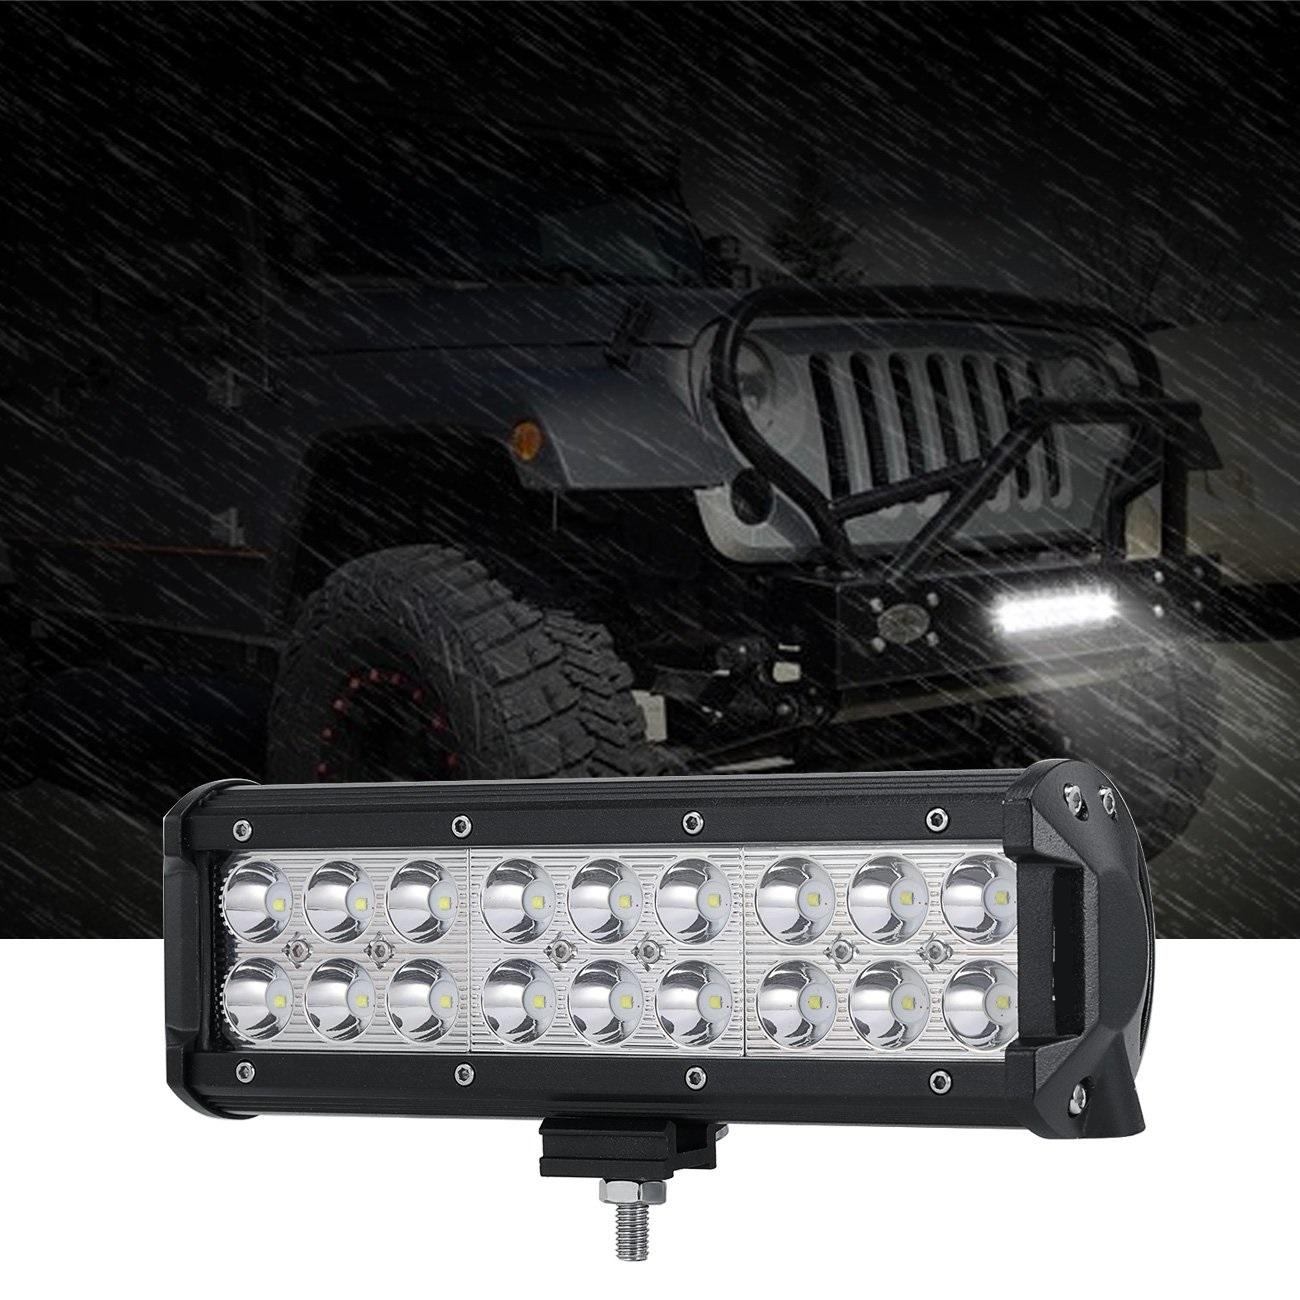 9inch LED Light Bar 54W Led Work Lights Spot Beam Off-Road Driving Lights Waterproof With Mounting Brackets For Jeep Pickup Trucks SUV ATV UTV Ford